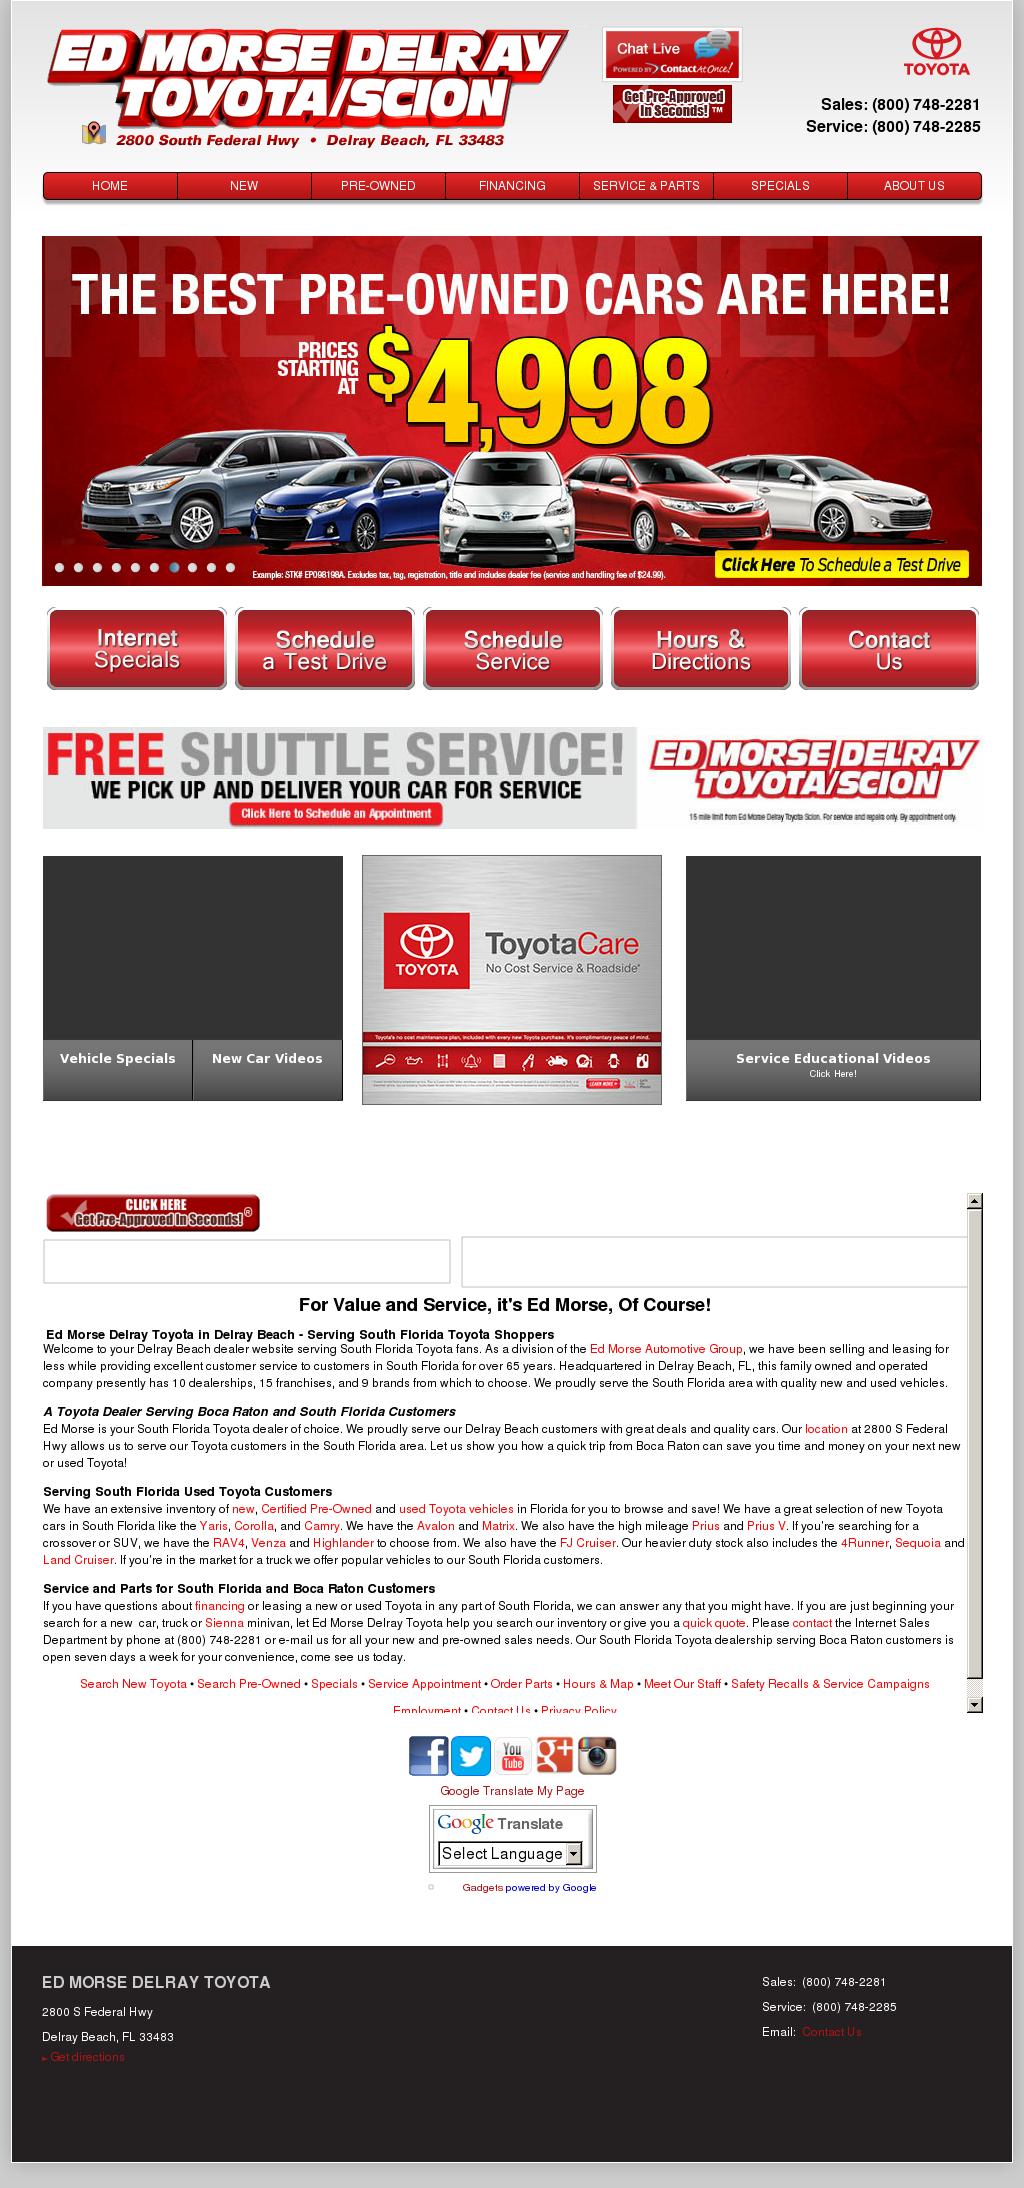 Ed Morse Delray Toyota Competitors, Revenue And Employees   Owler Company  Profile